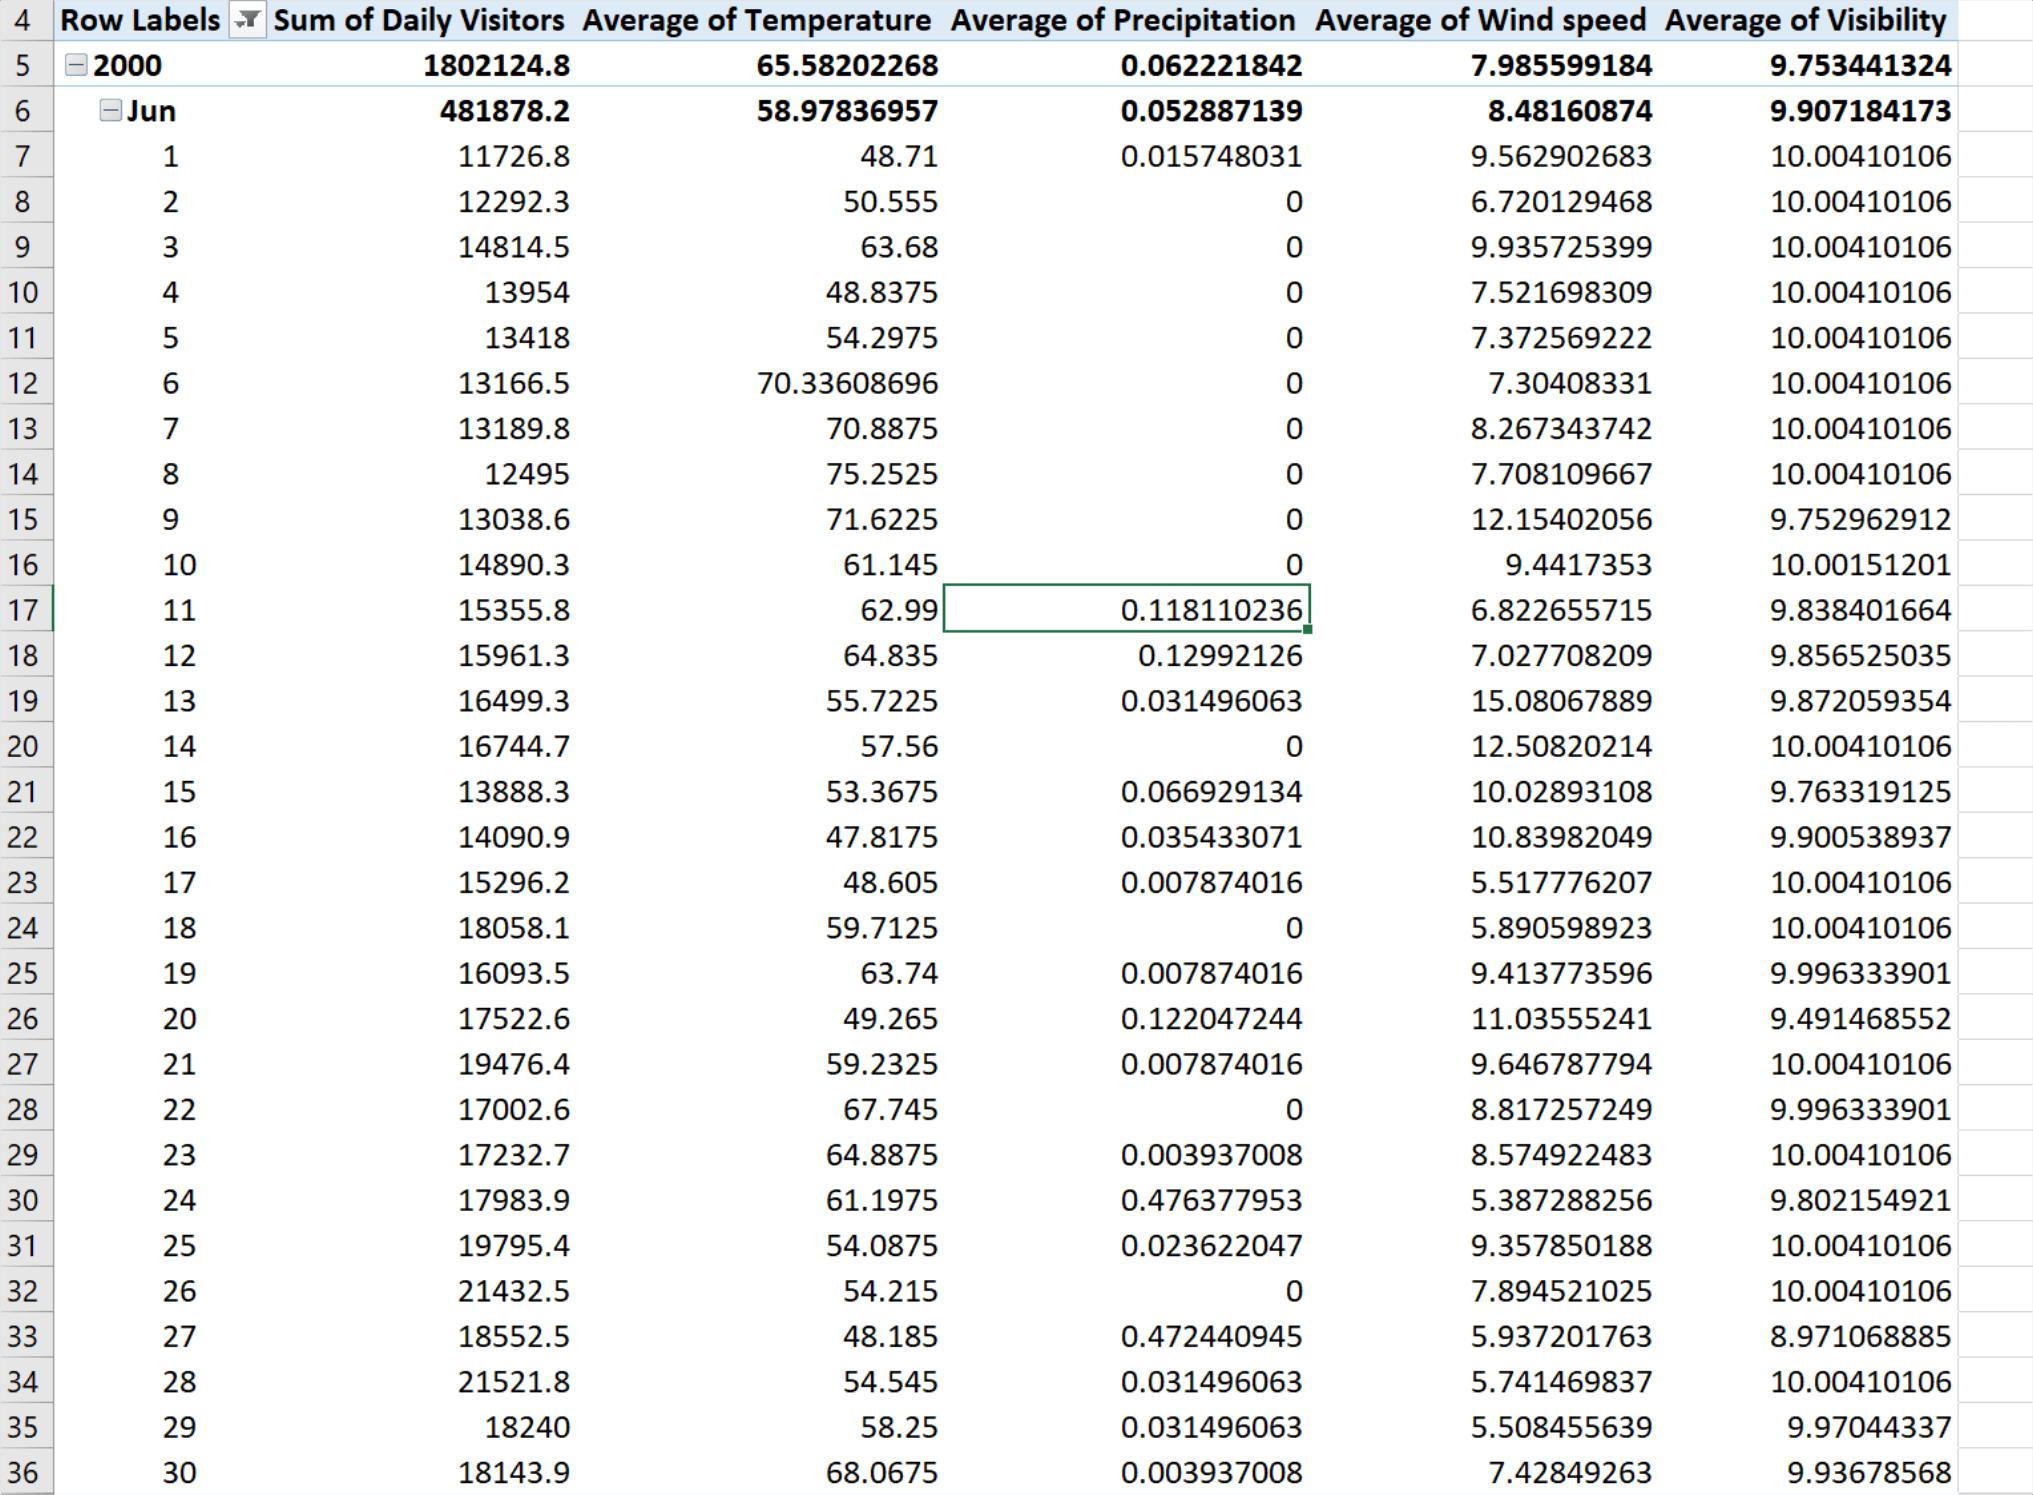 Microsoft Excel pivot table including weather metrics